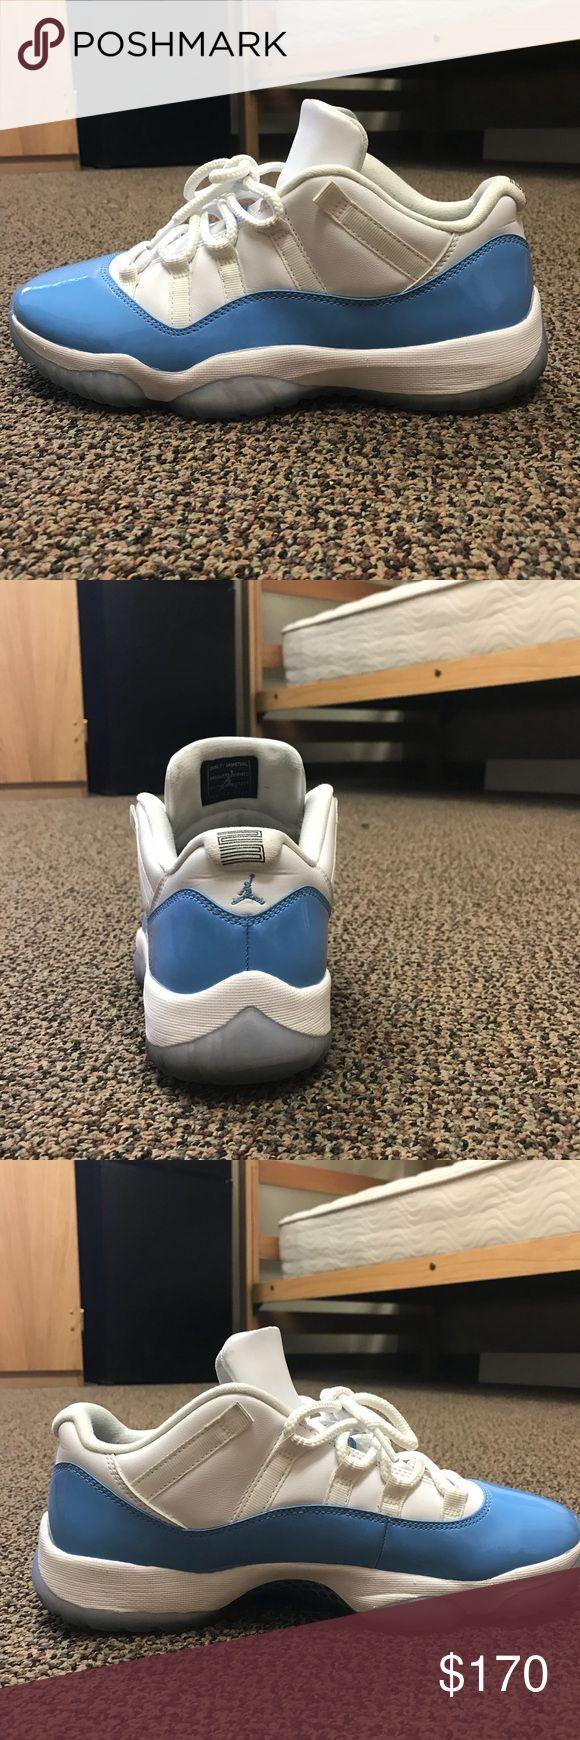 Jordan retro 11s (UNC) Worn, good condition. No box! Jordan Shoes Sneakers